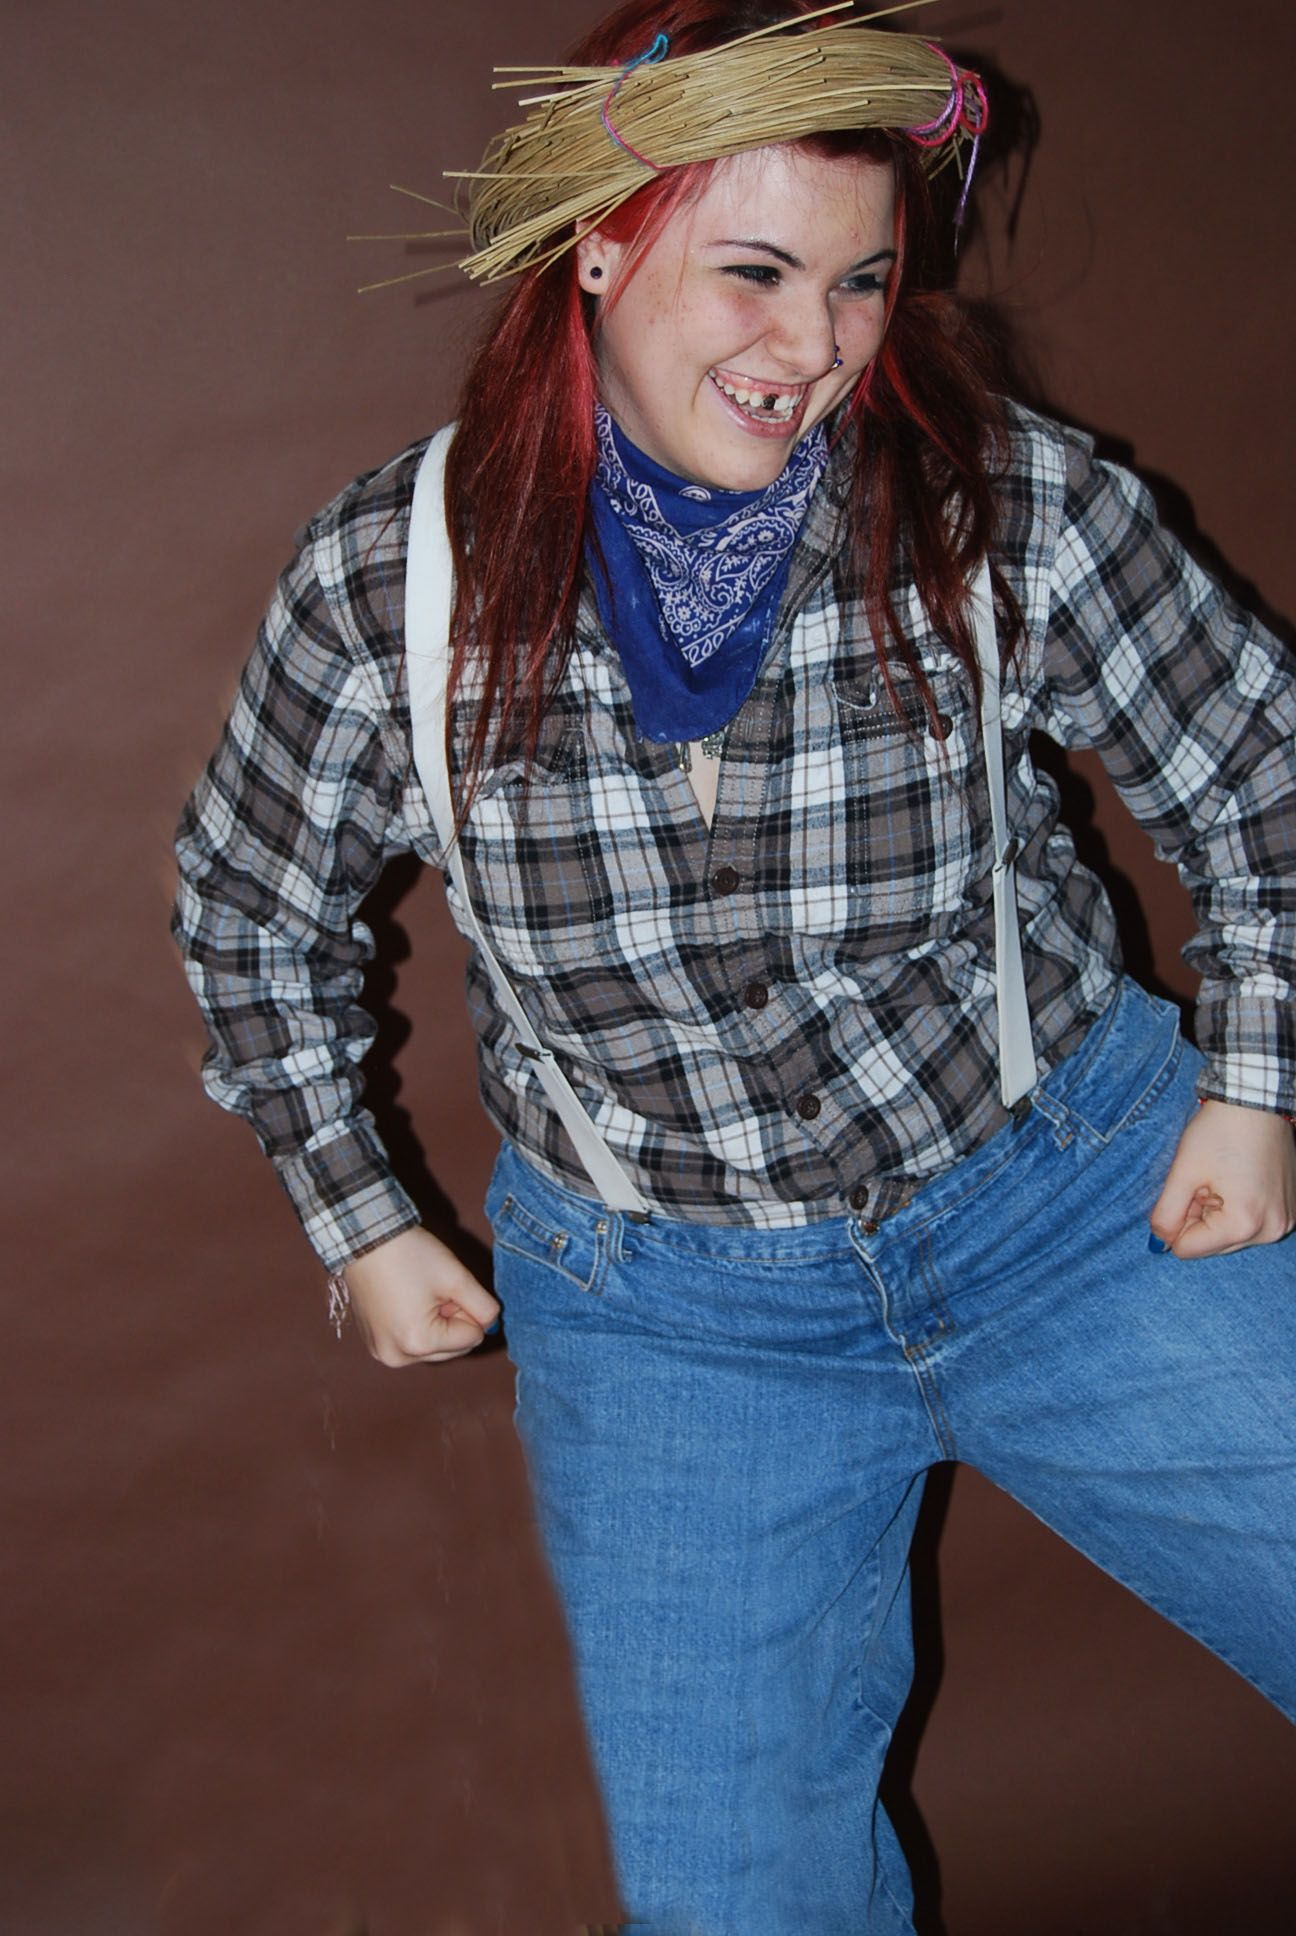 hillbilly photography pinterest hillbilly hillbilly